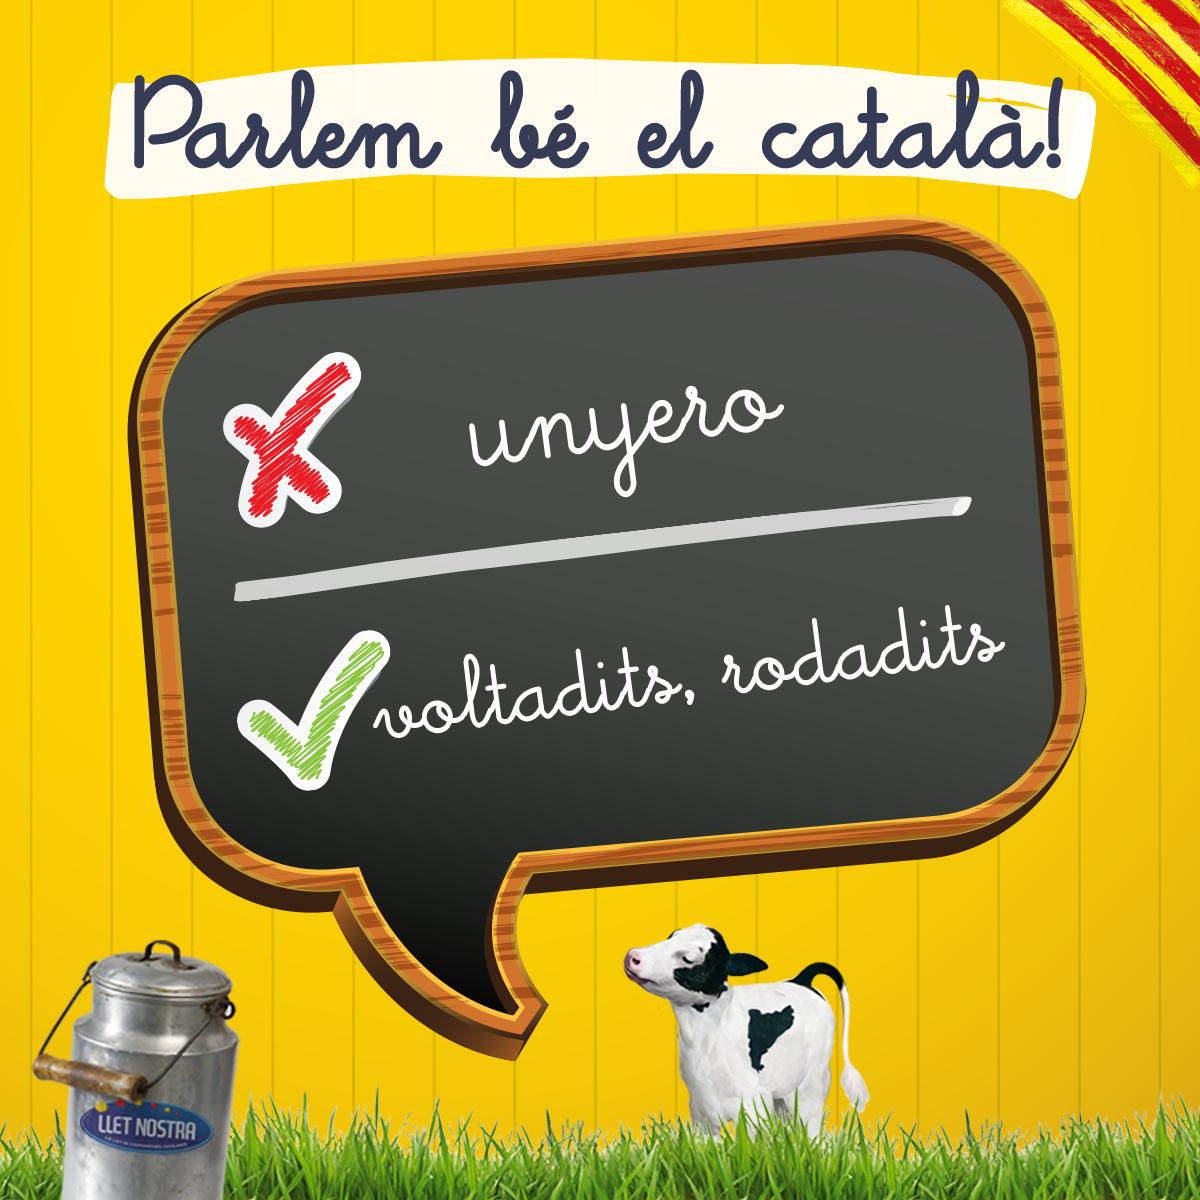 #totsfemcollaambelcatalà #català